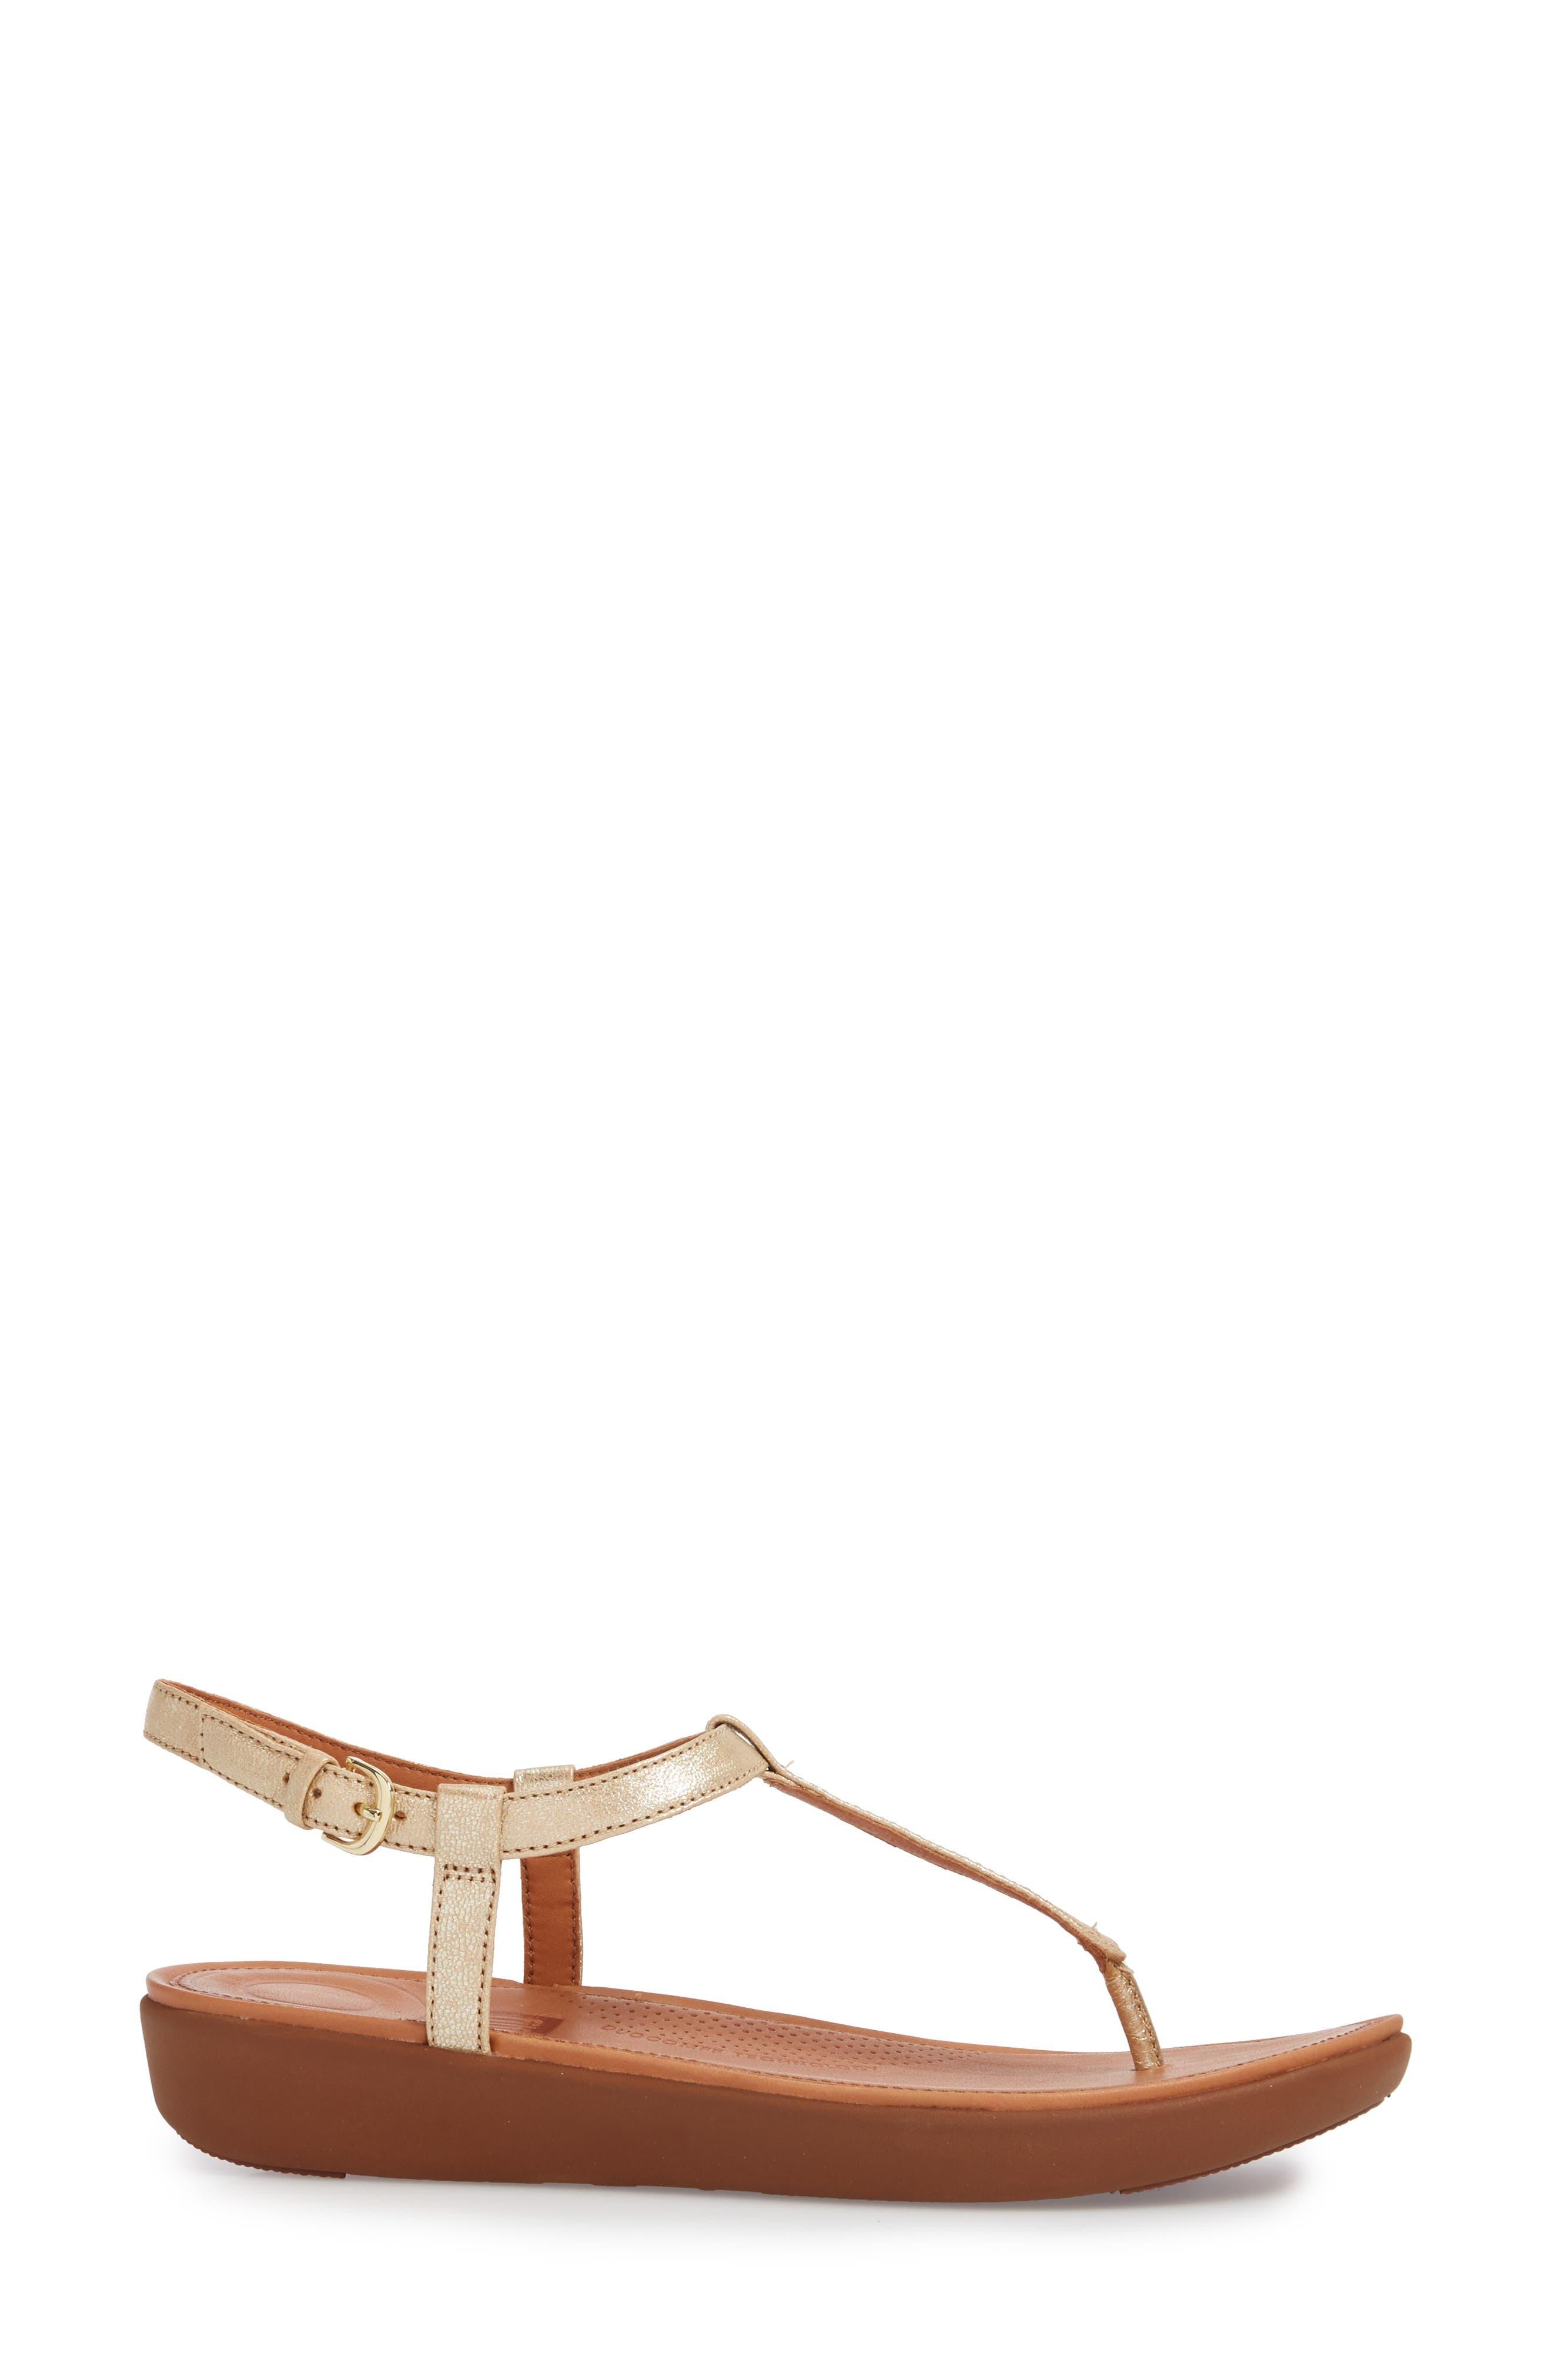 Tia Thong Sandal,                             Alternate thumbnail 3, color,                             Pale Gold Leather